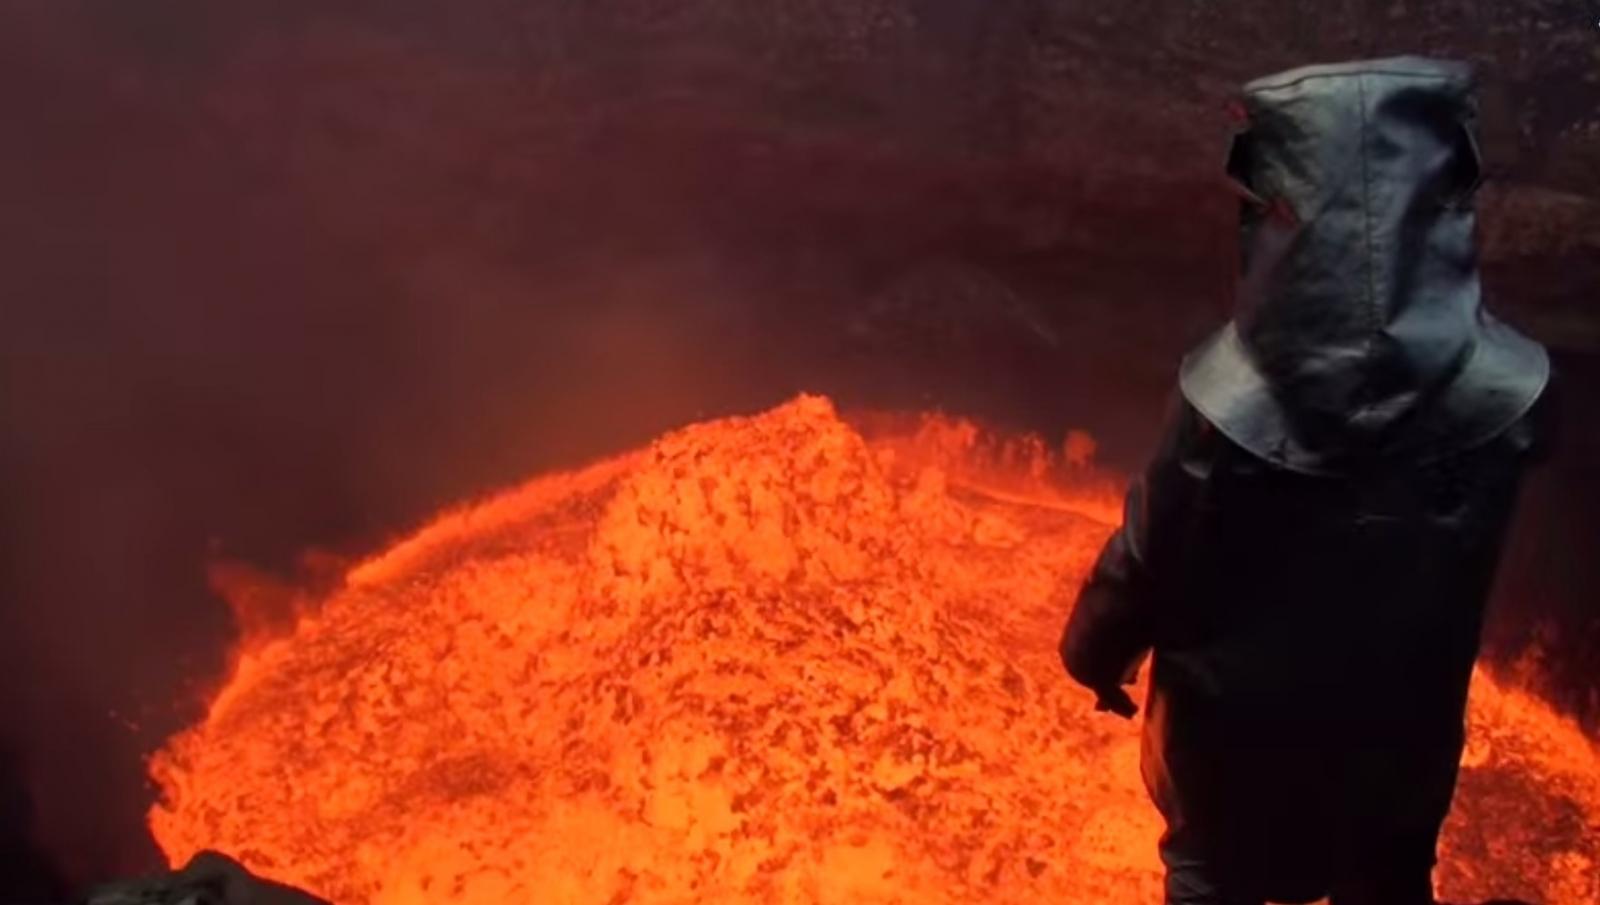 Explorer descends into volcano